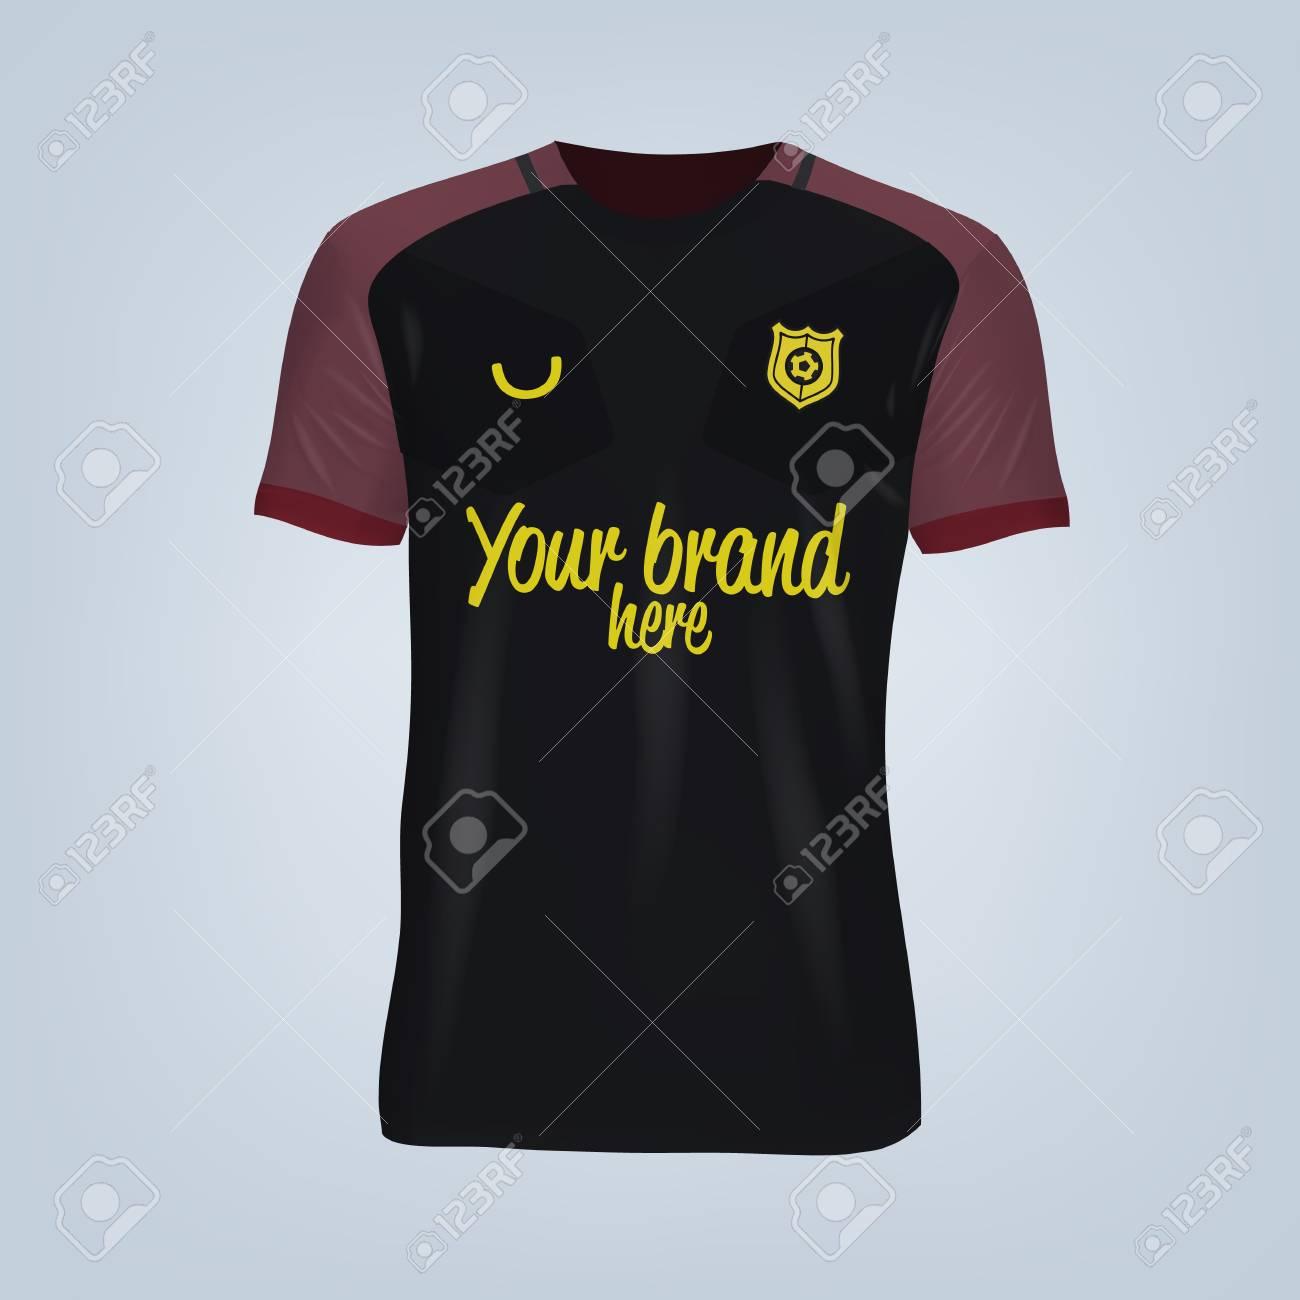 Vector illustration of football t-shirt template. - 84012152